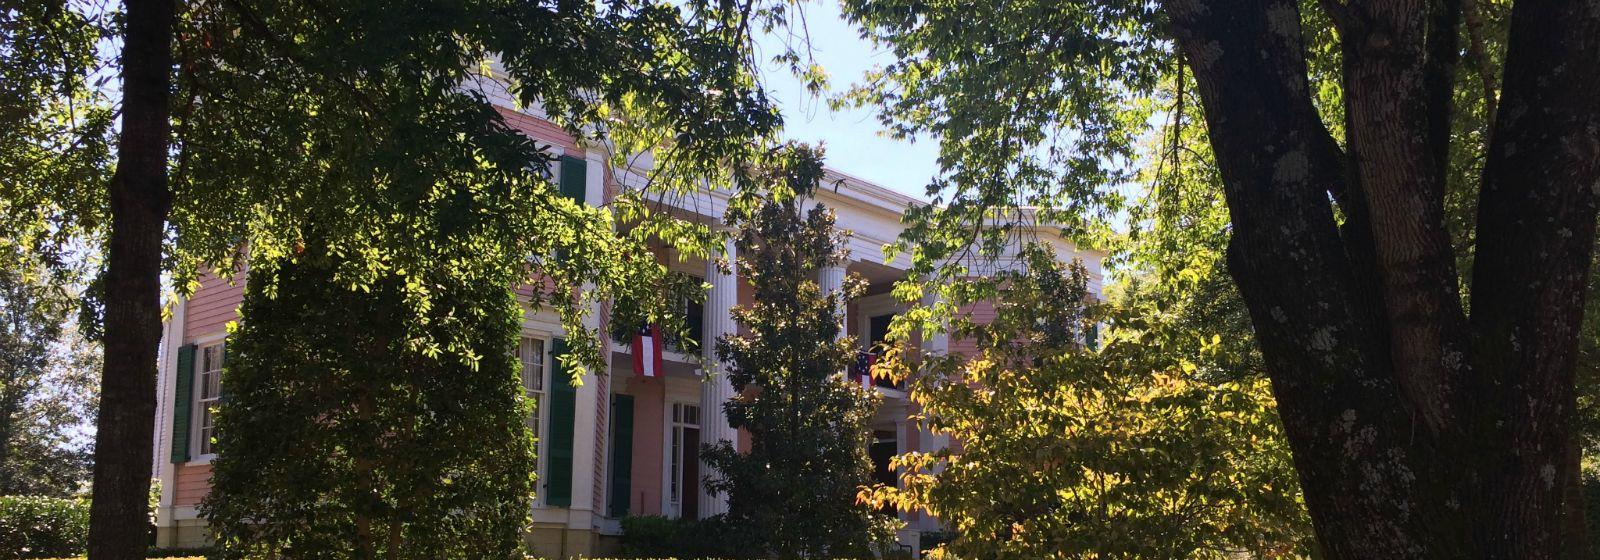 best dating athens georgia neighborhoods